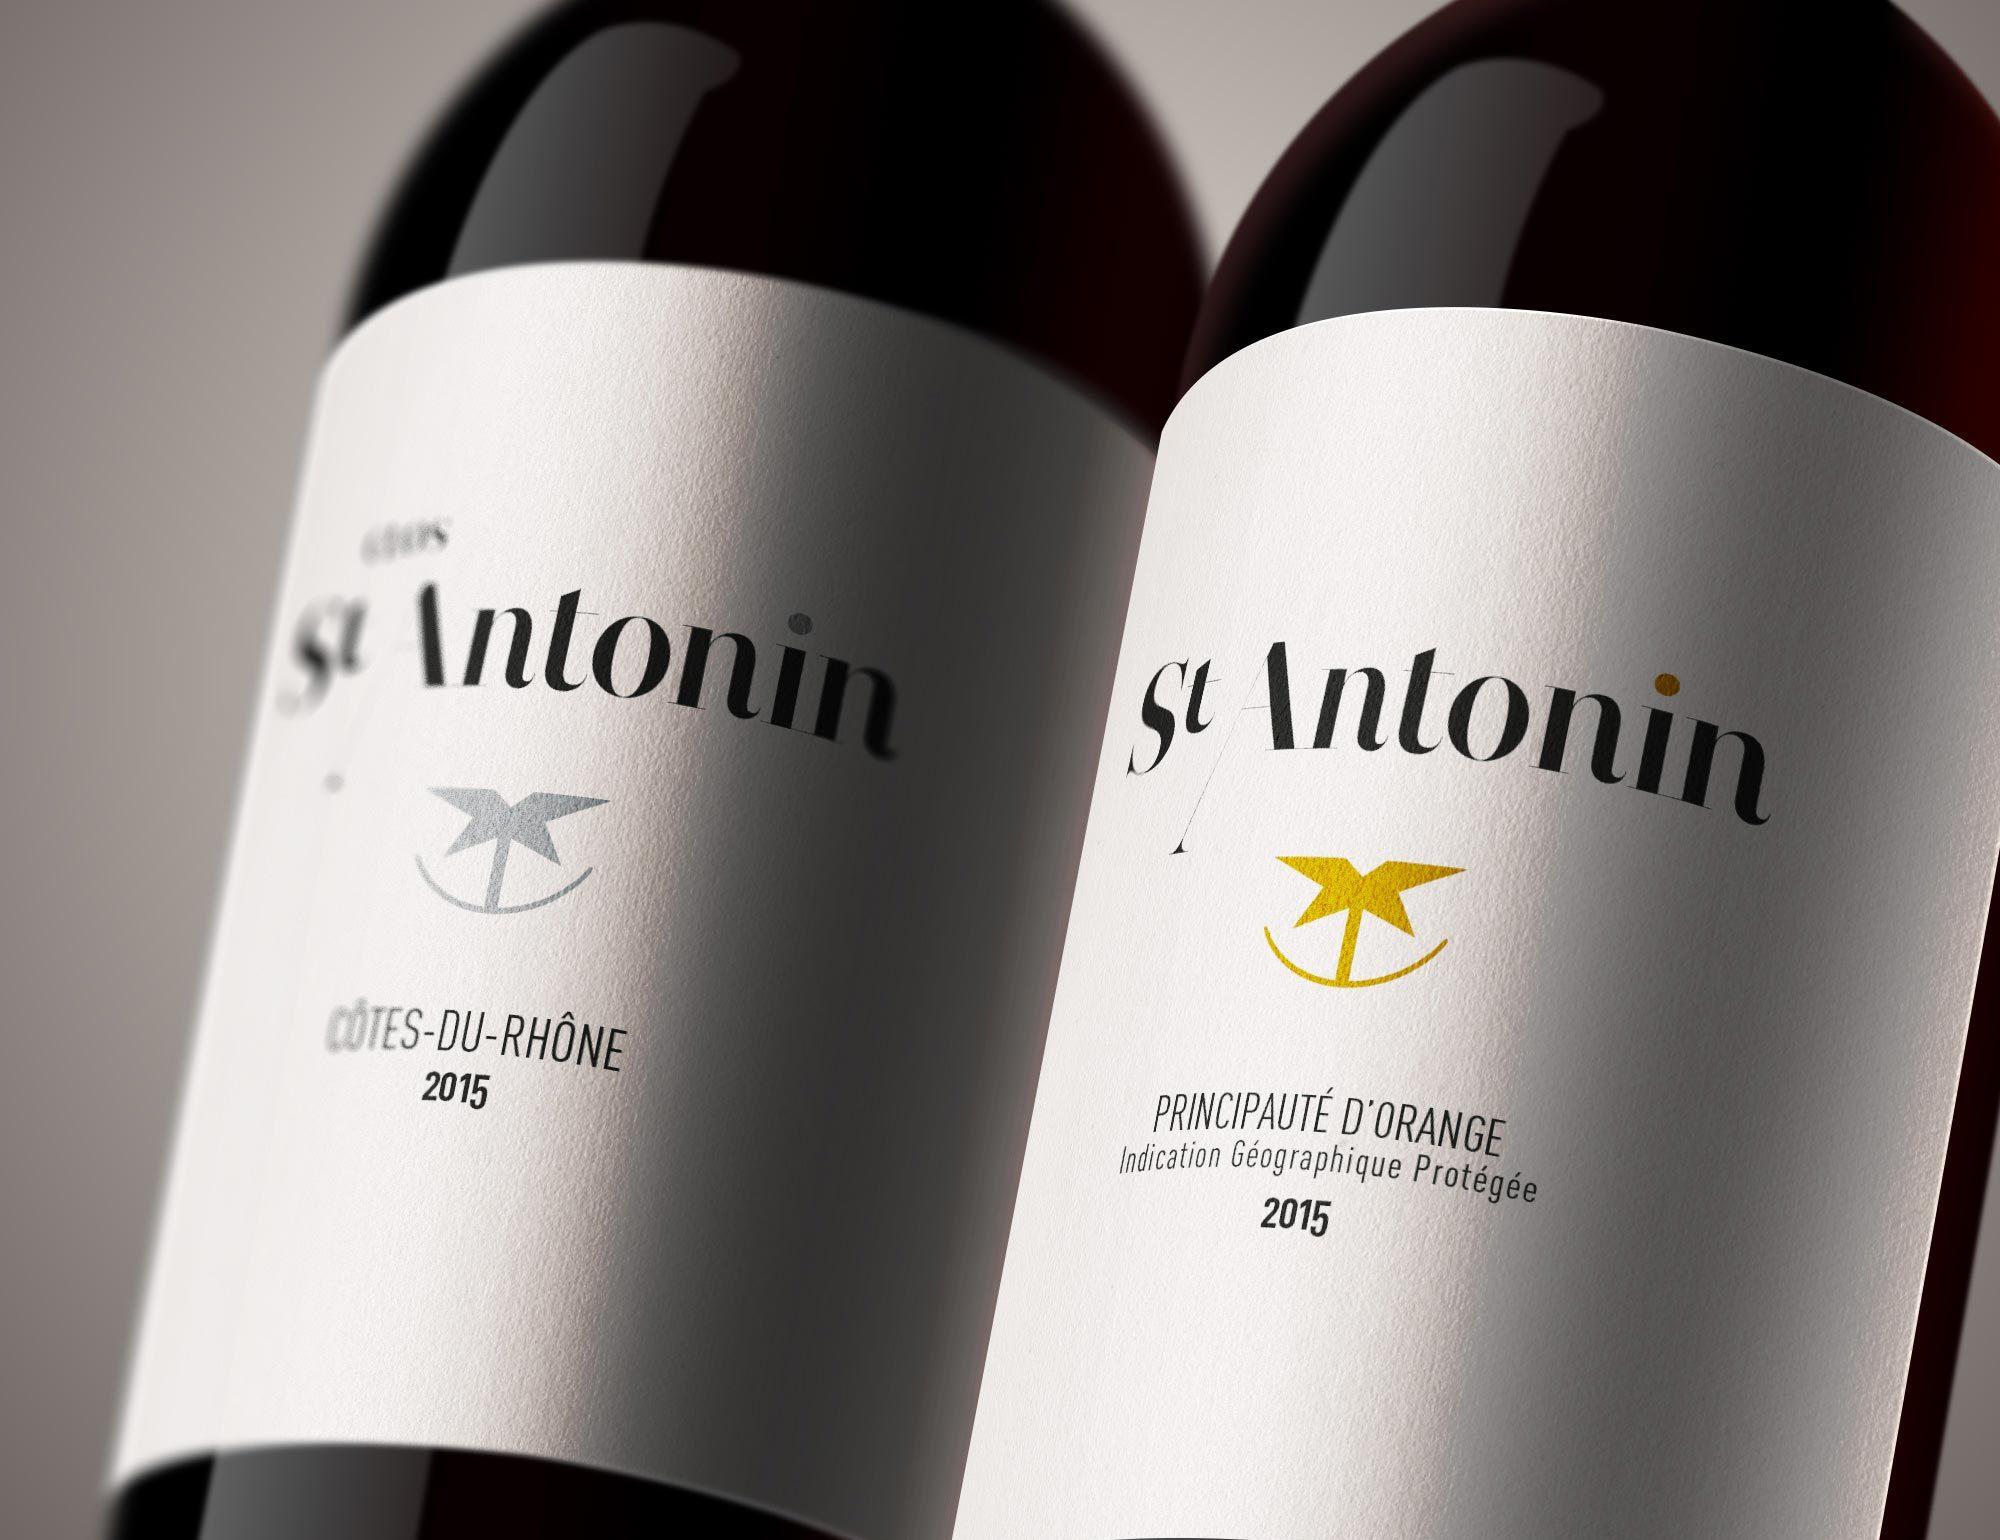 Domaine-Saint-Antonin-bouteille-identite-visuelle-packaging-valerie-mersier